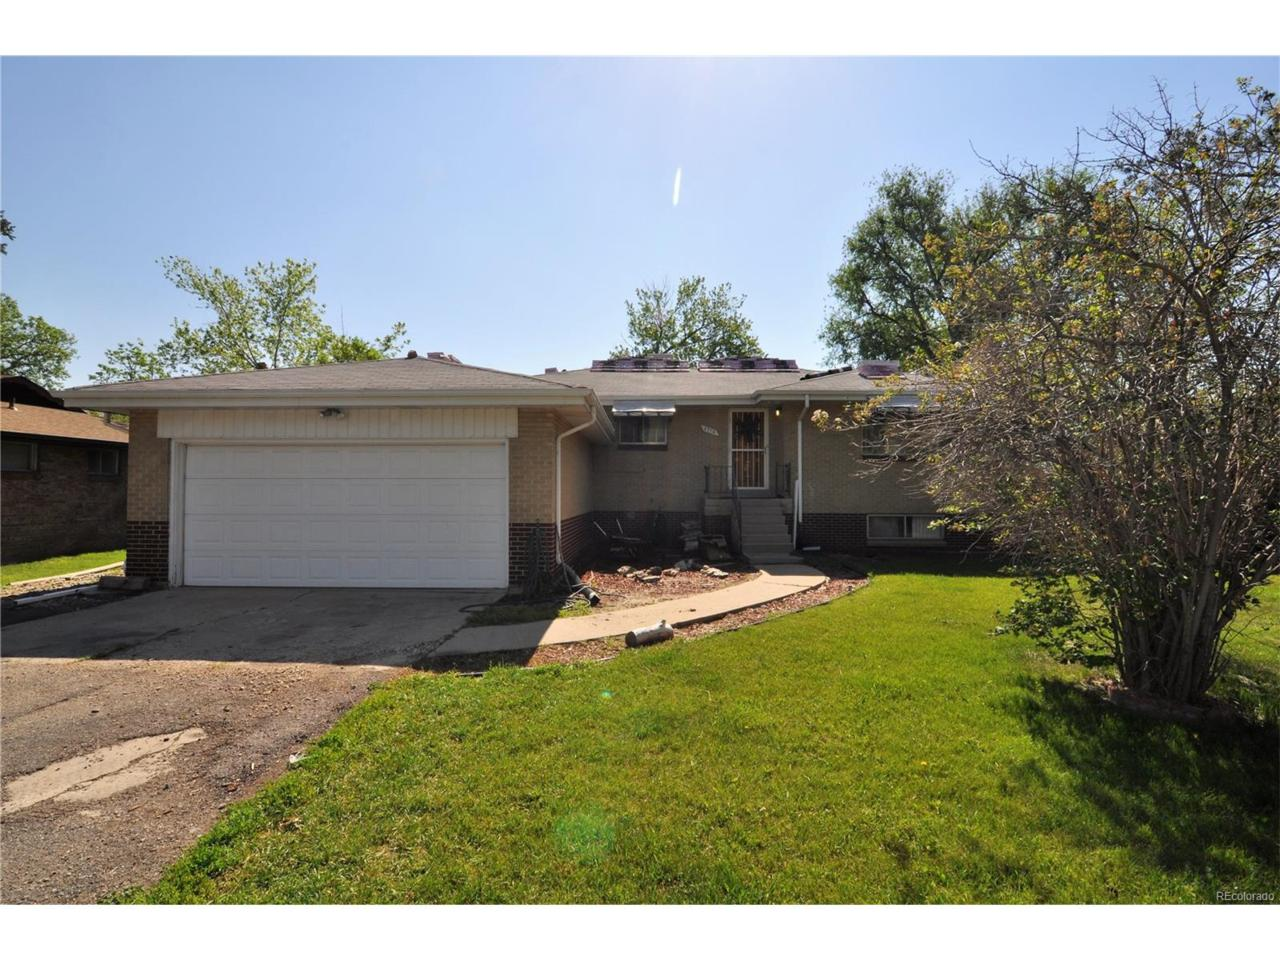 4570 Holland Street, Wheat Ridge, CO 80033 (MLS #9205750) :: 8z Real Estate